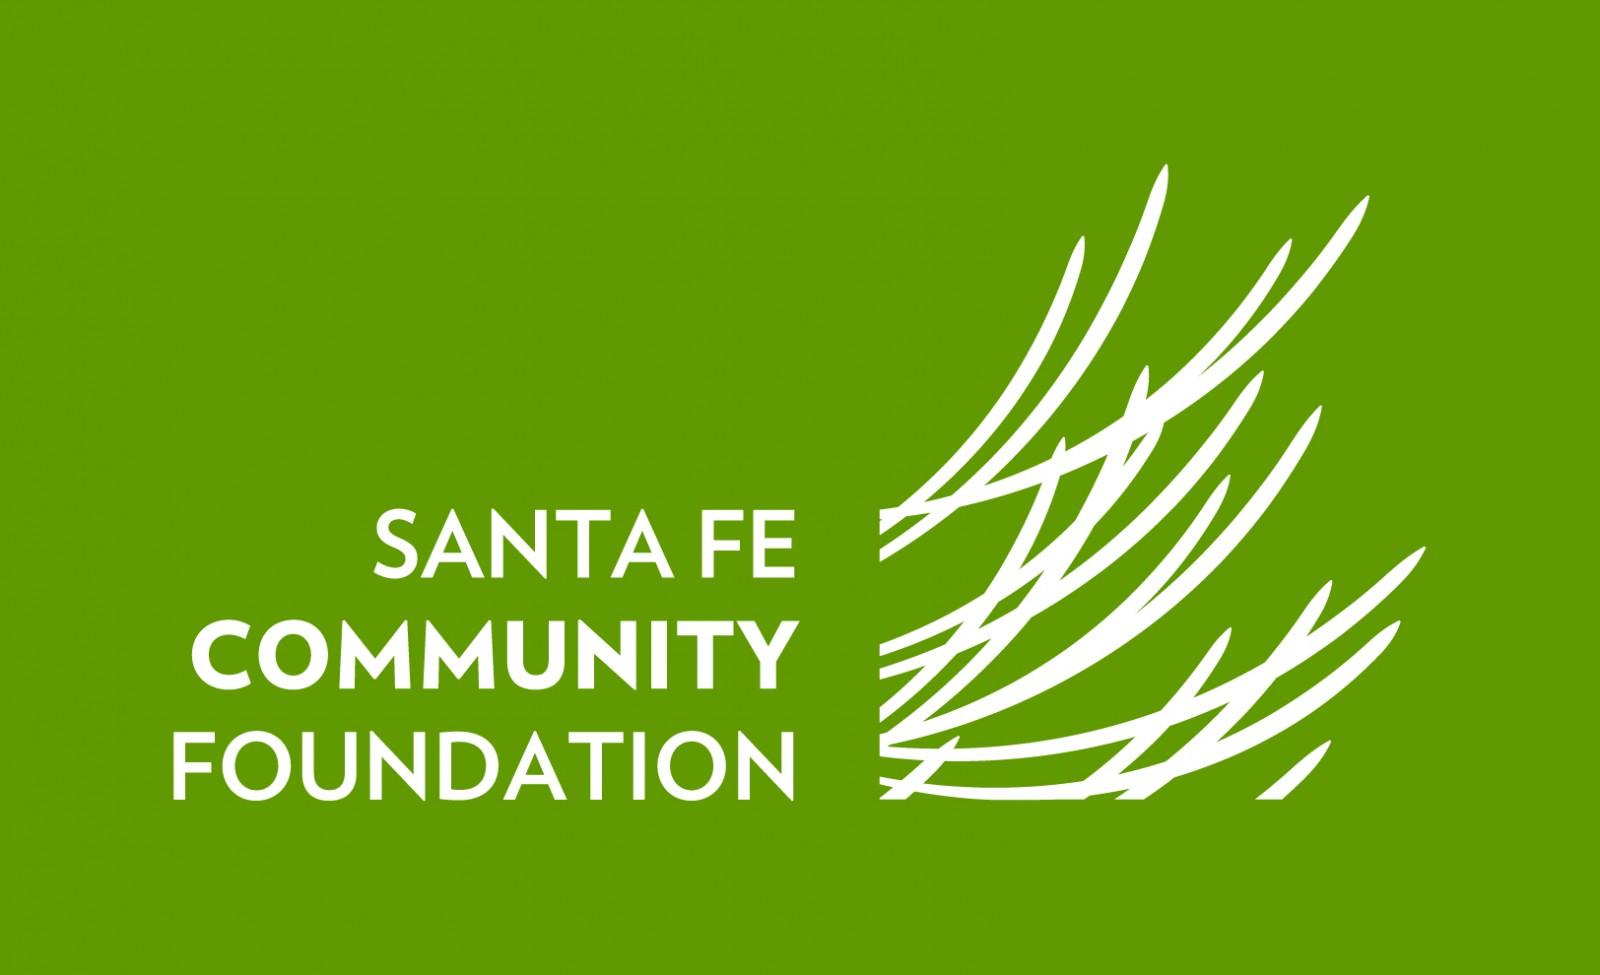 SFCF-logo-PMS7496-Horiz-Block